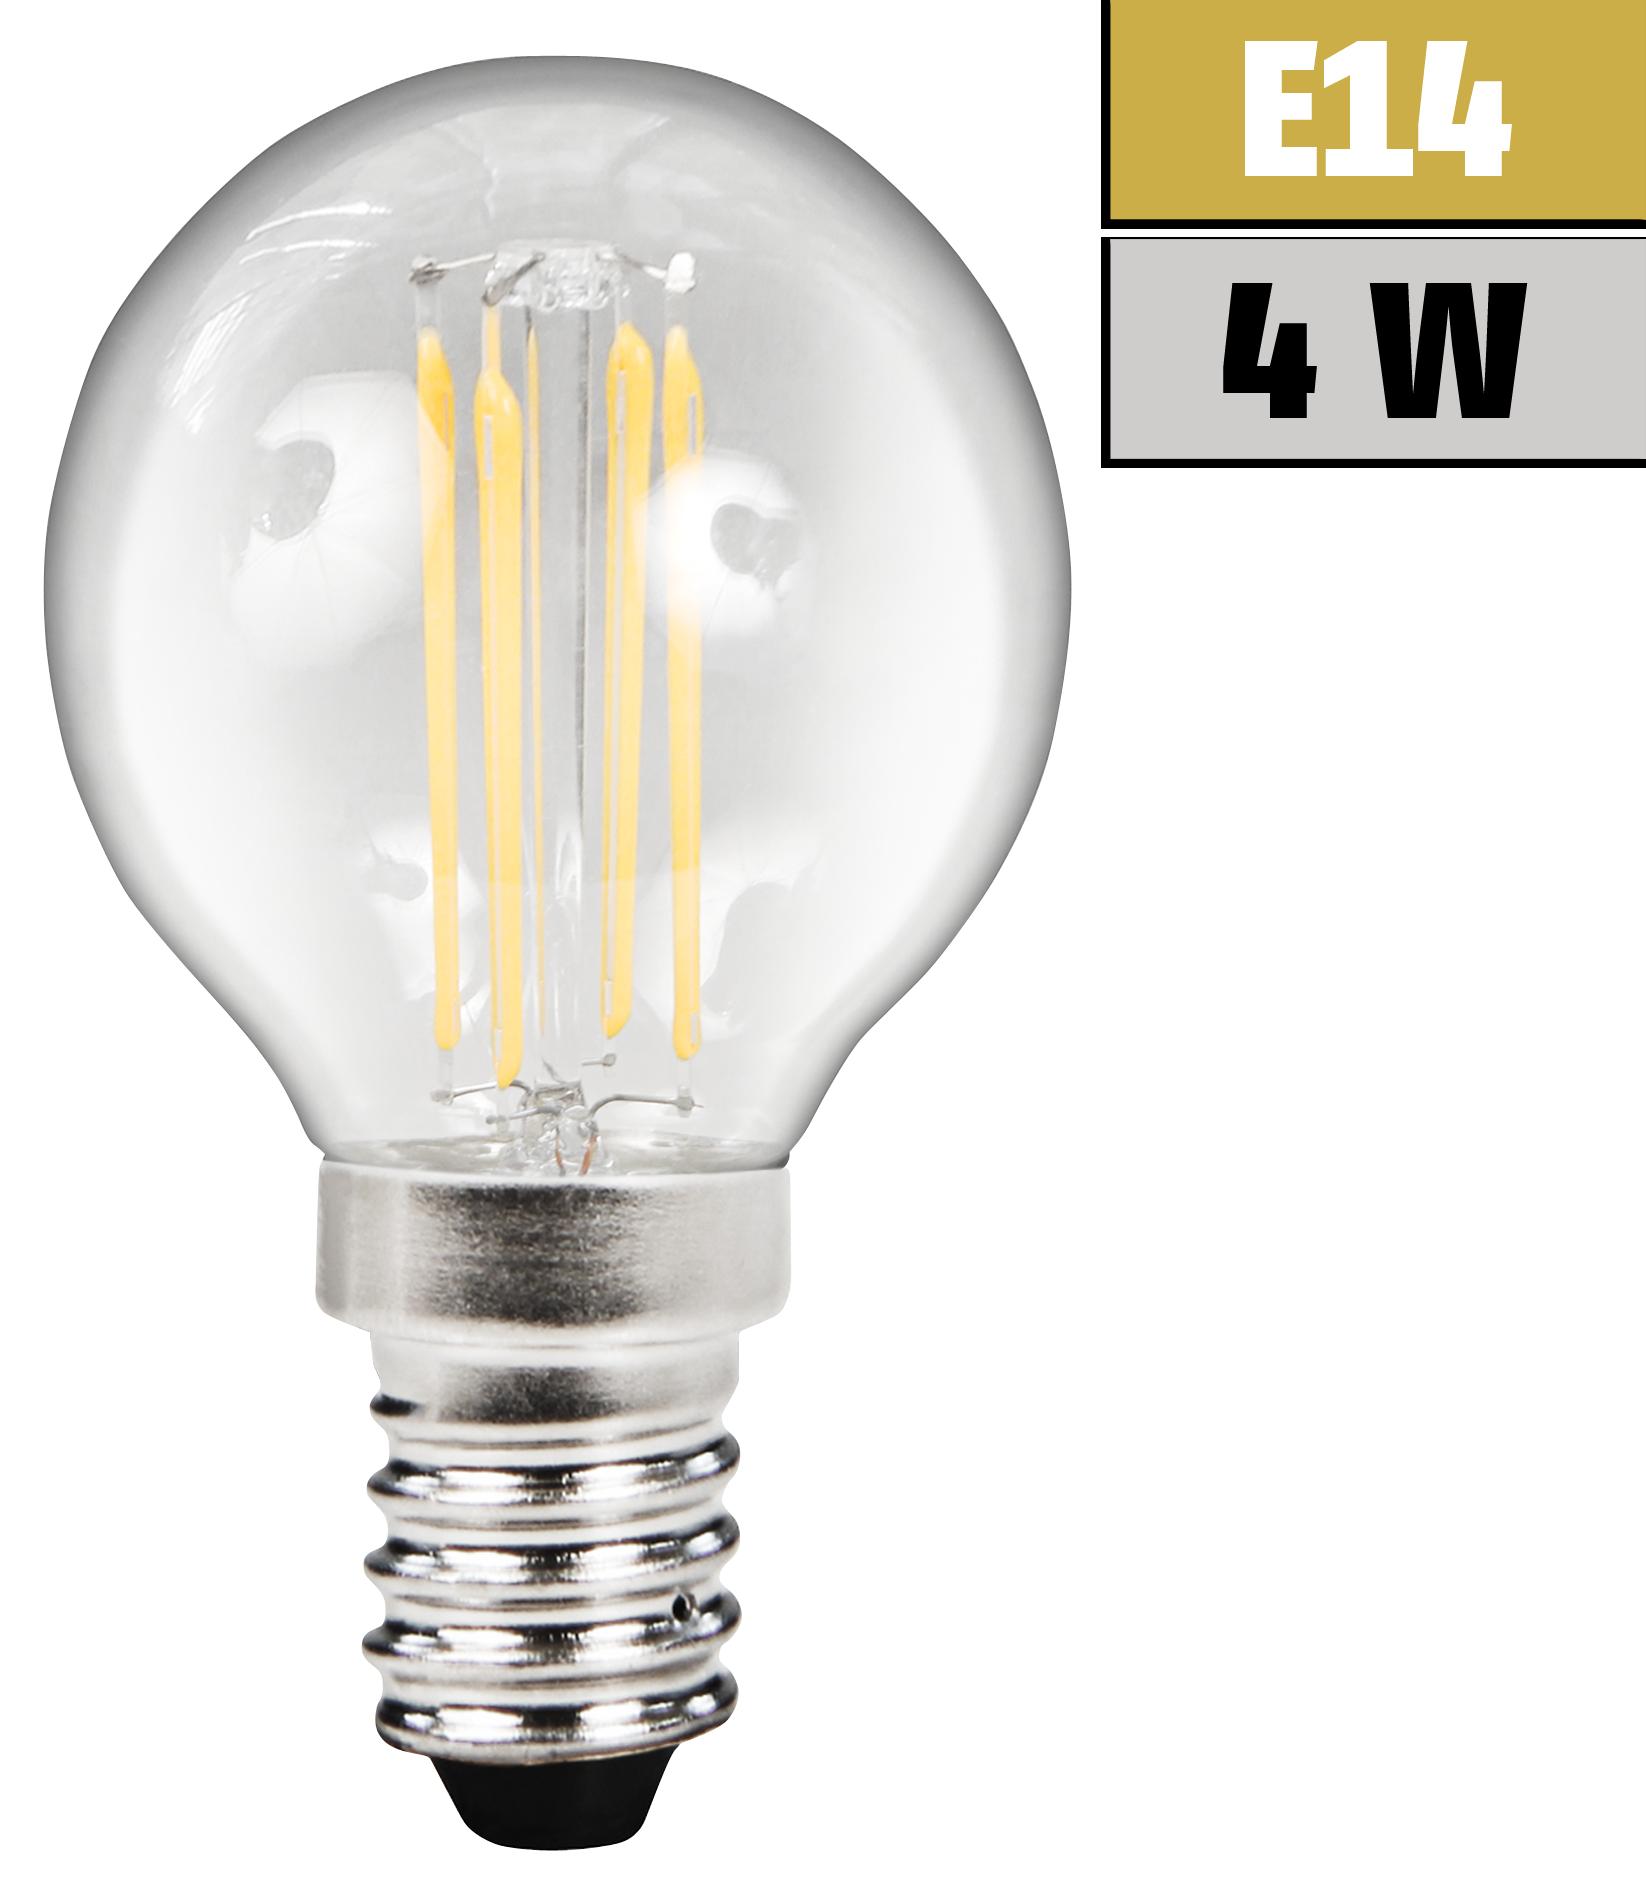 LED Filament Tropfenlampe McShine ''Filed'', E14, 4W, 470lm, warmweiß